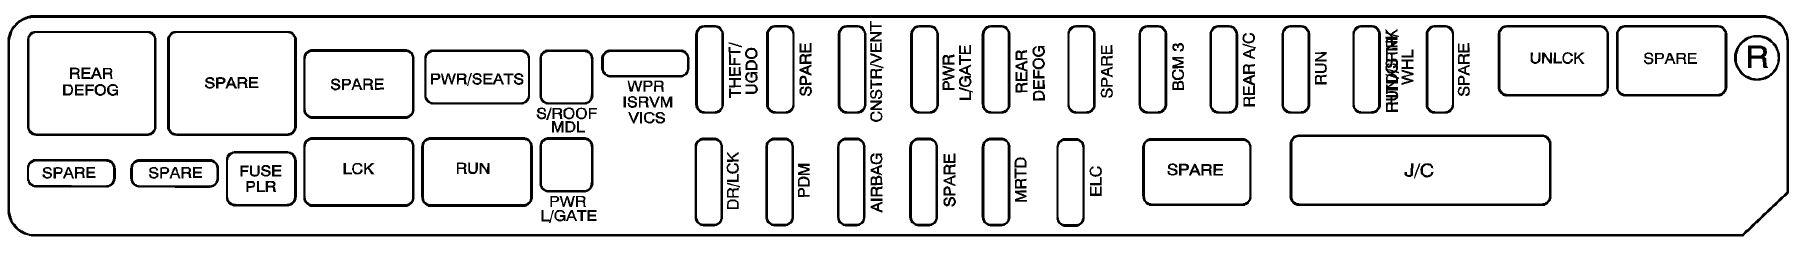 2004 Cadillac Srx Fuse Diagram Wiring Diagrams Functional Functional Adriengirod Fr